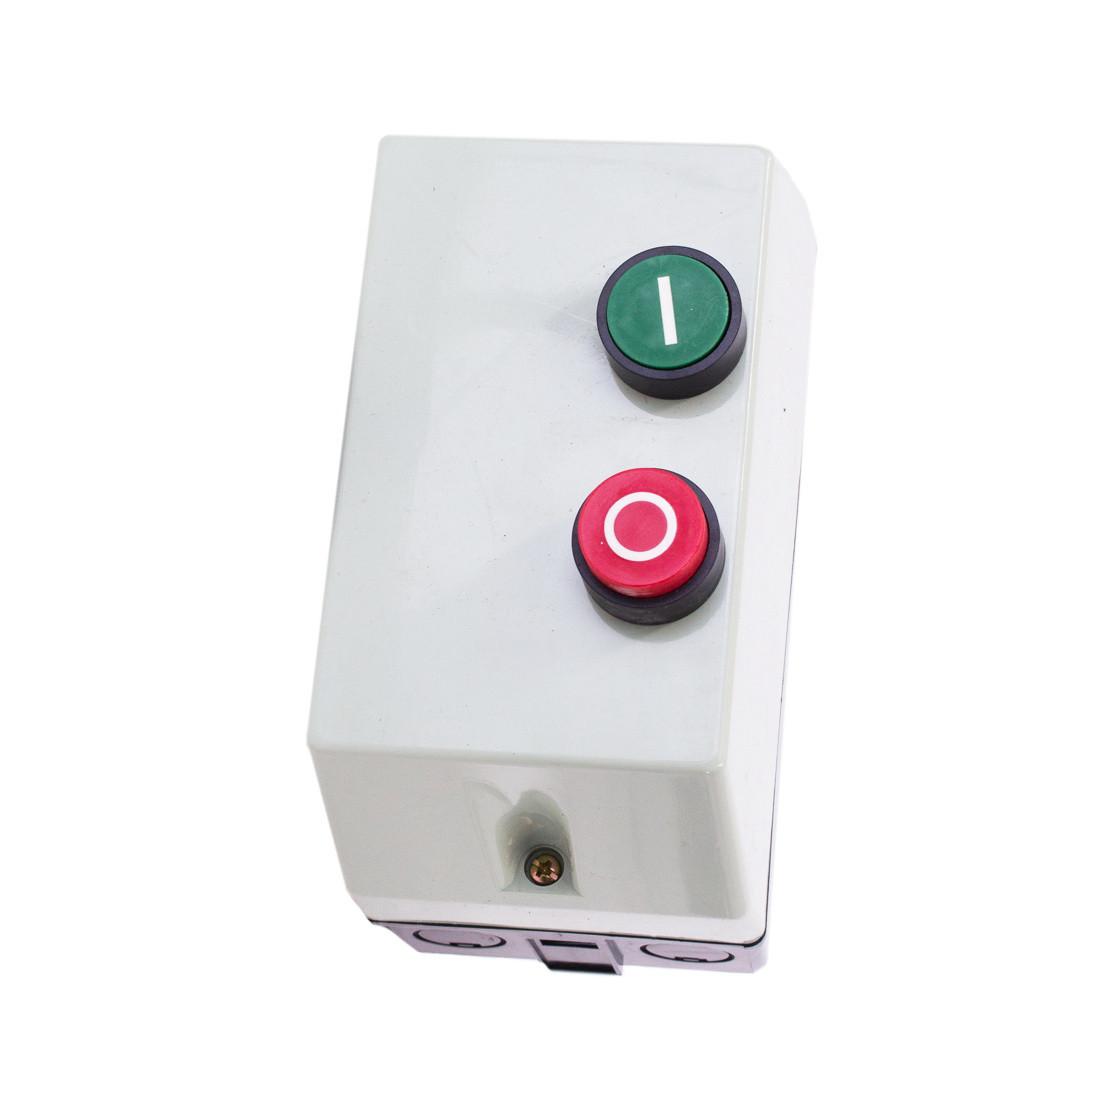 Контактор iPower КМИ-10960 9А АС 220В